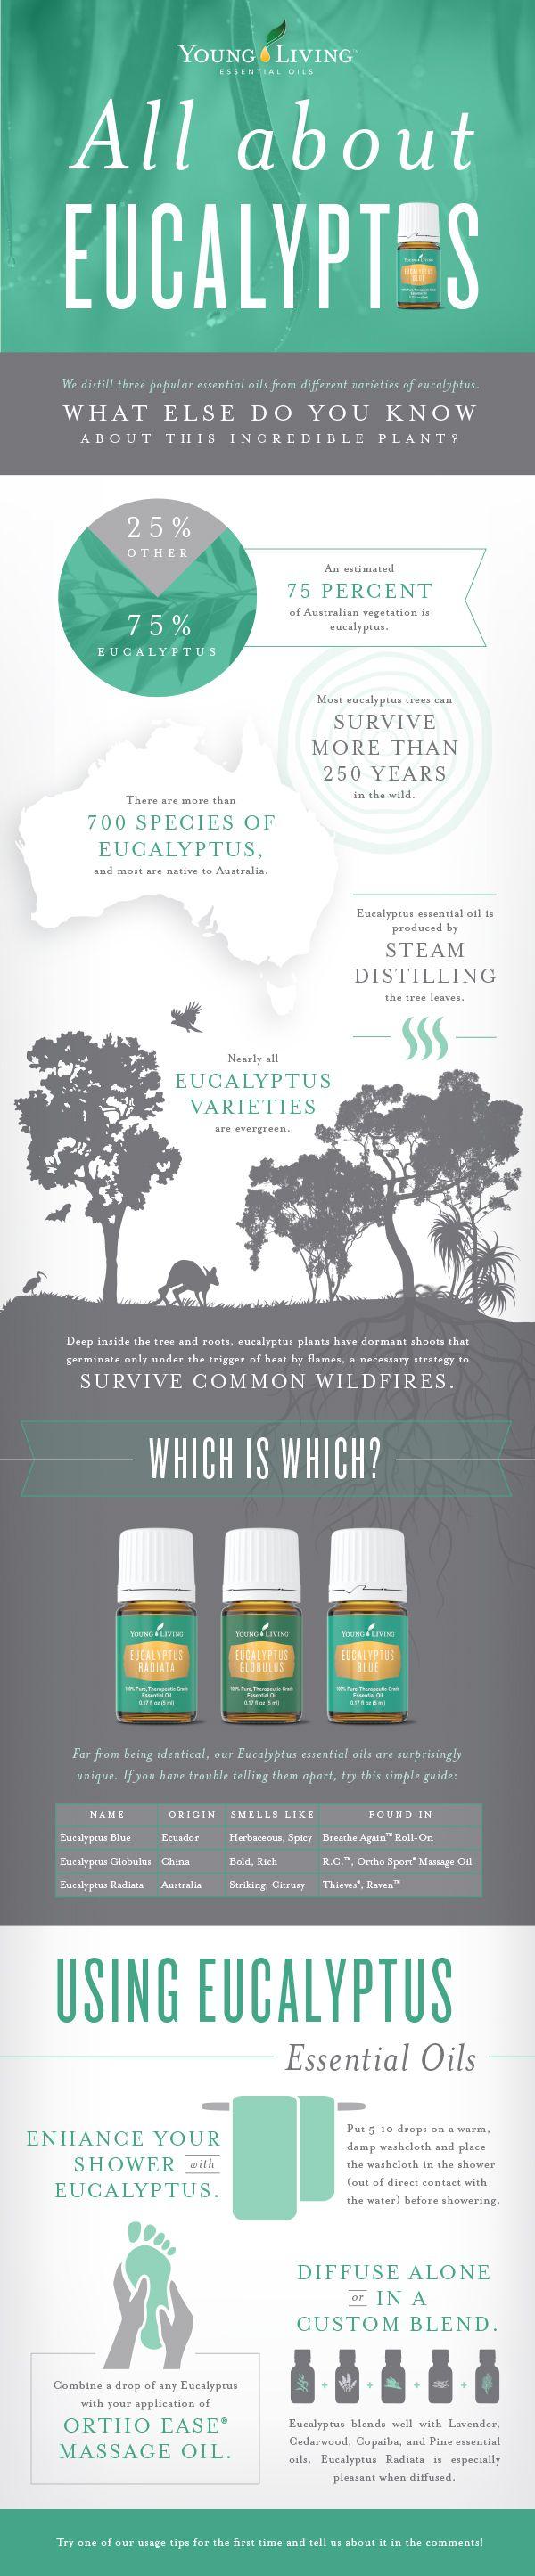 Eucalyptus Essential Oil - Young Living - Eucalyptus Radiata, Eucalyptus Globulus, Eucalyptus Blue